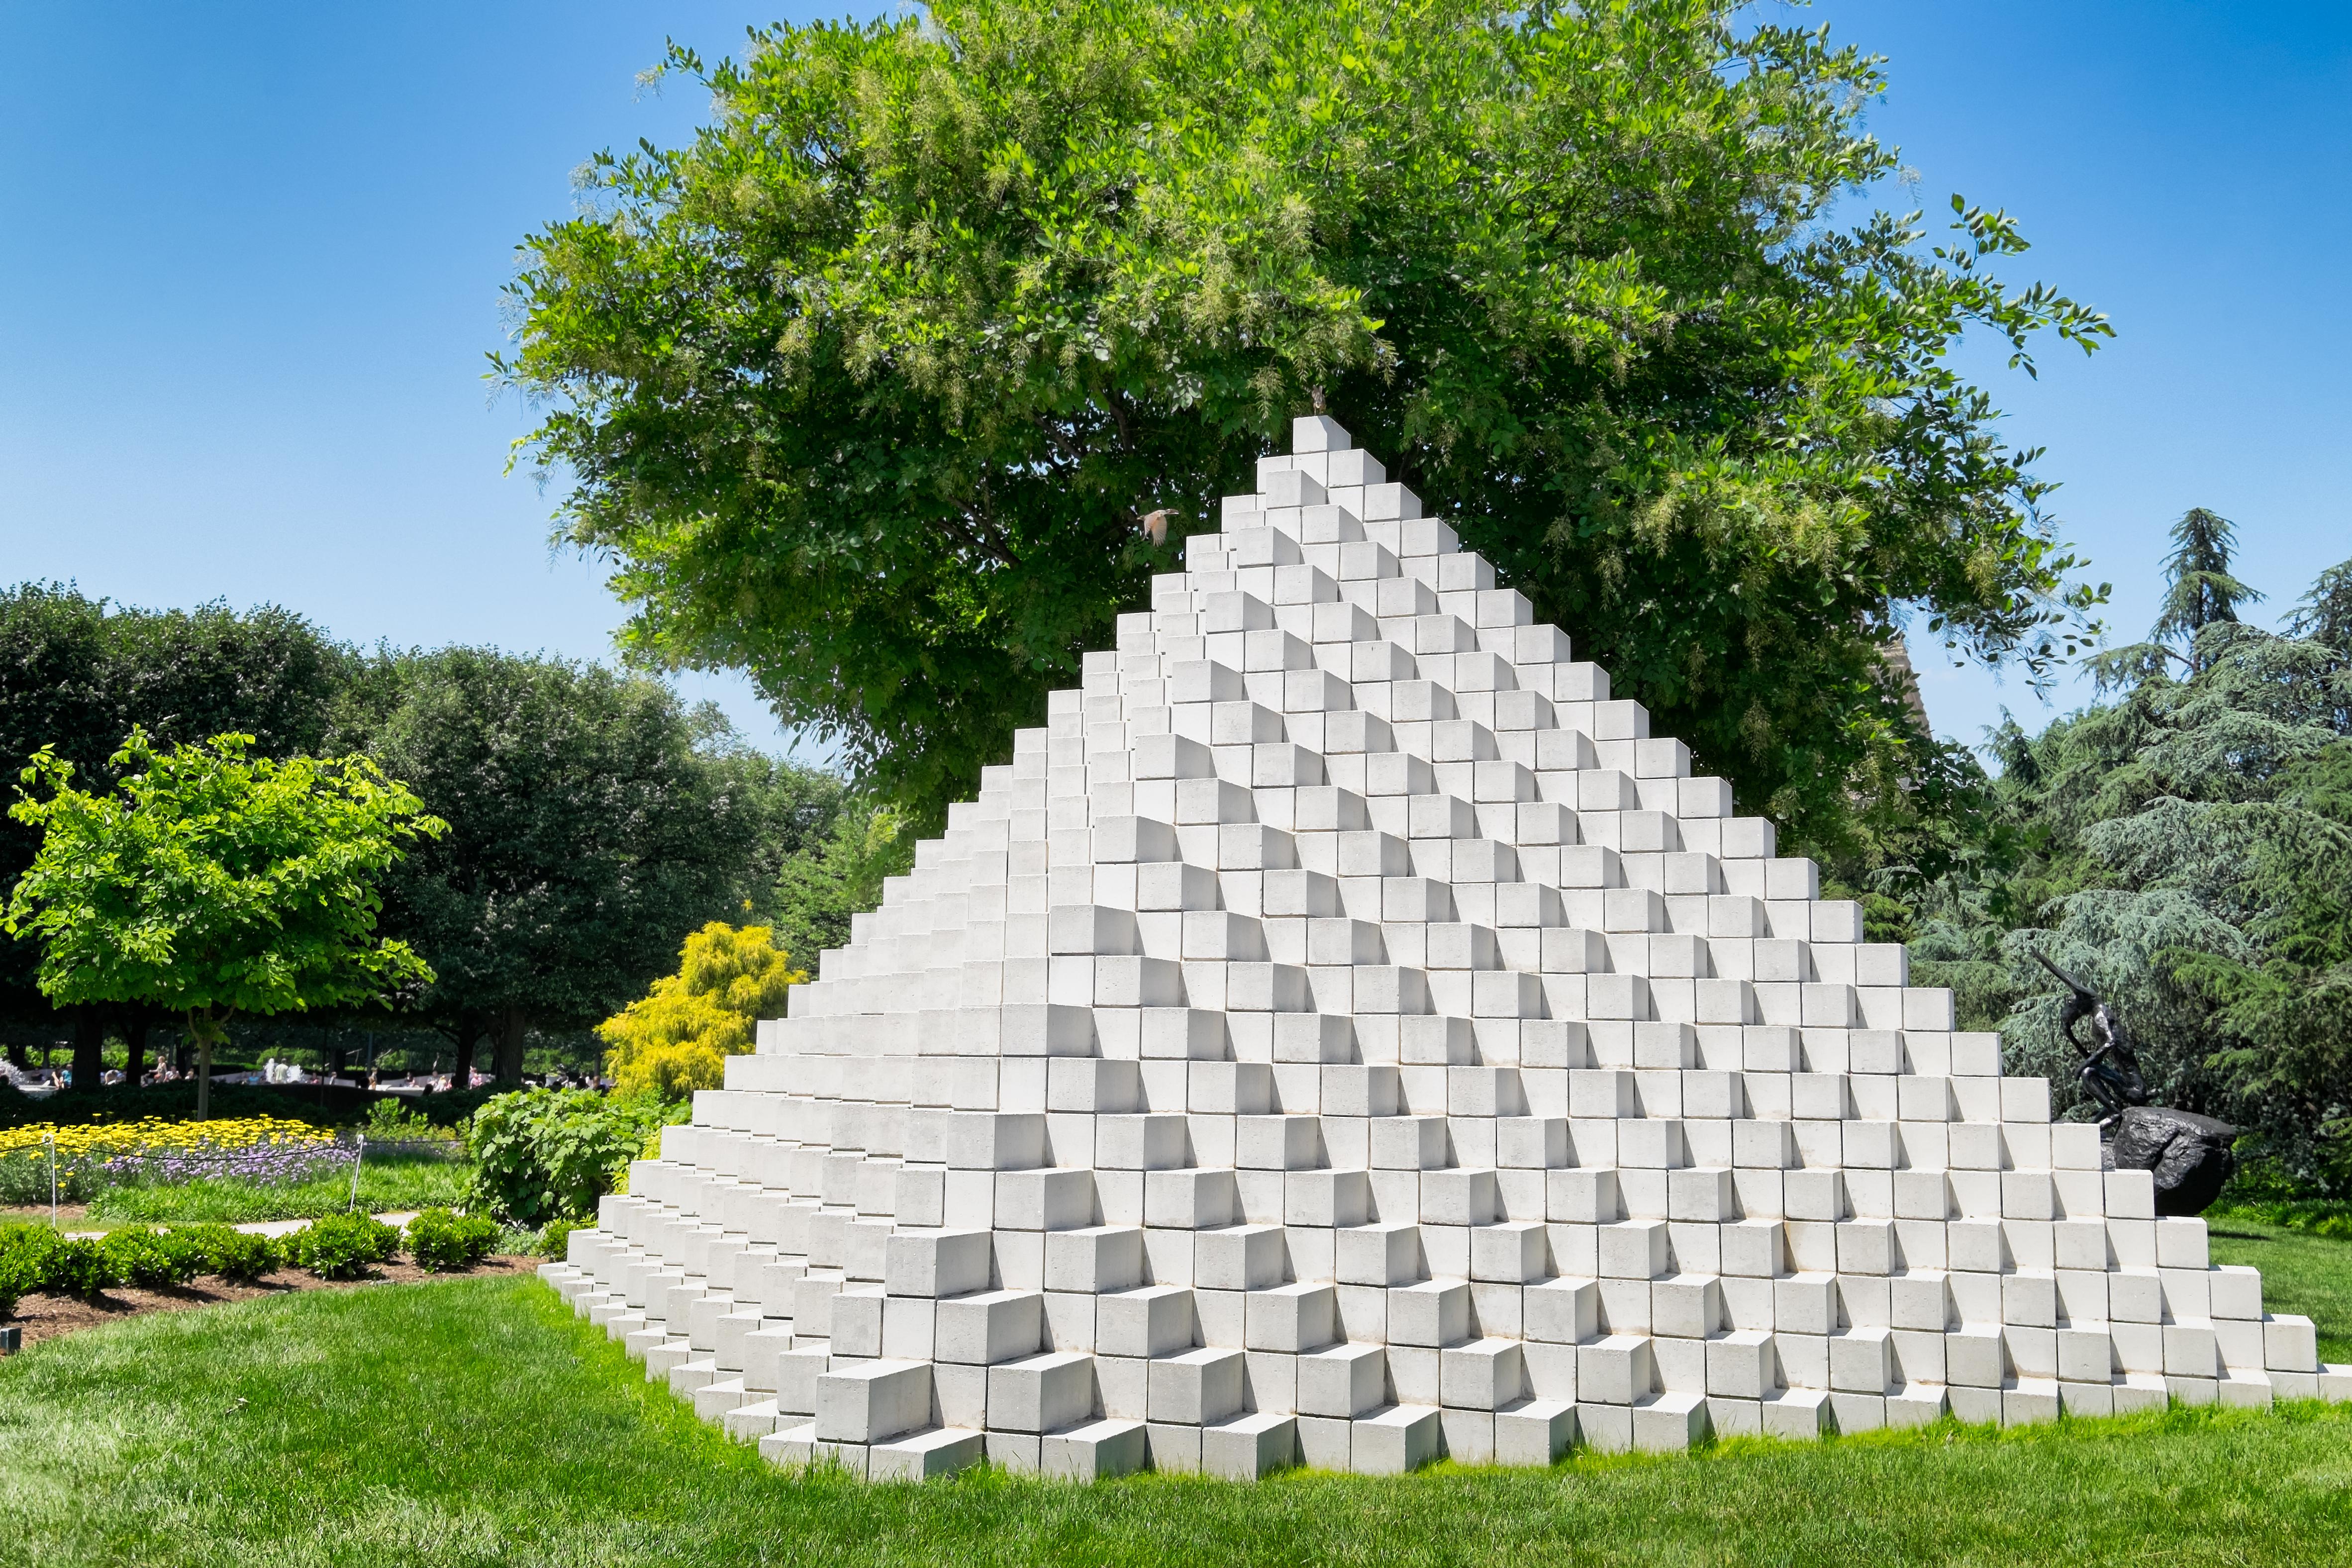 The Sculpture Garden of the National Gallery of Art, Washington D.C.